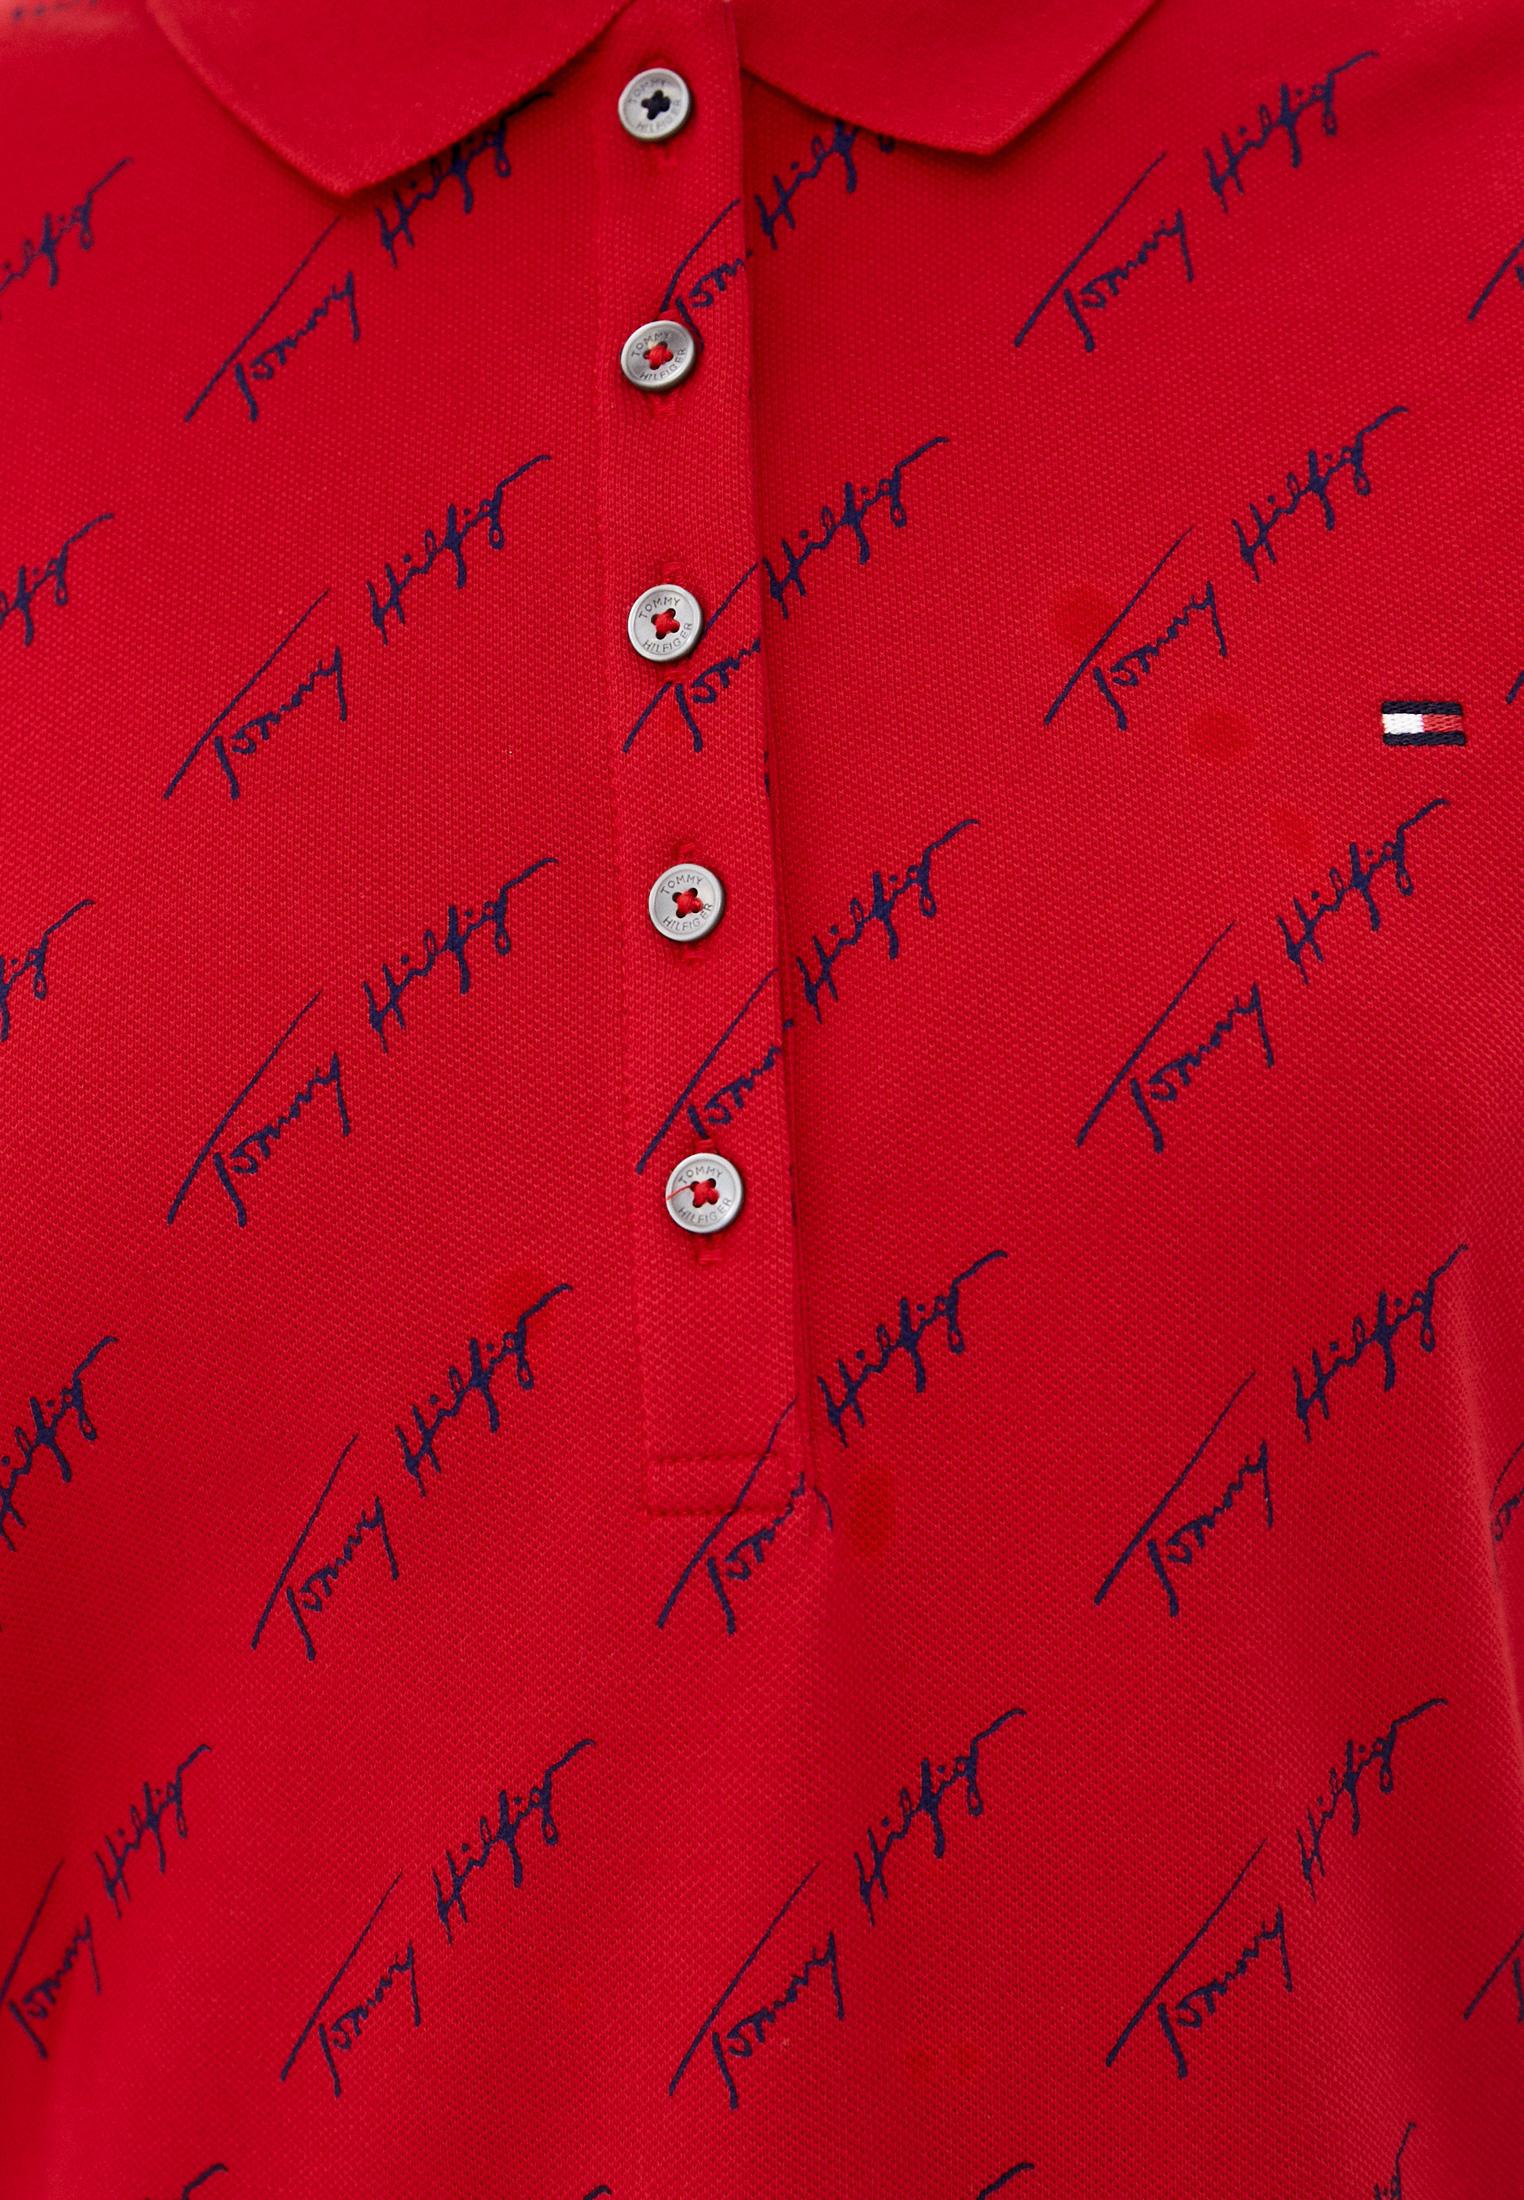 Платье Tommy Hilfiger (Томми Хилфигер) WW0WW26193: изображение 4